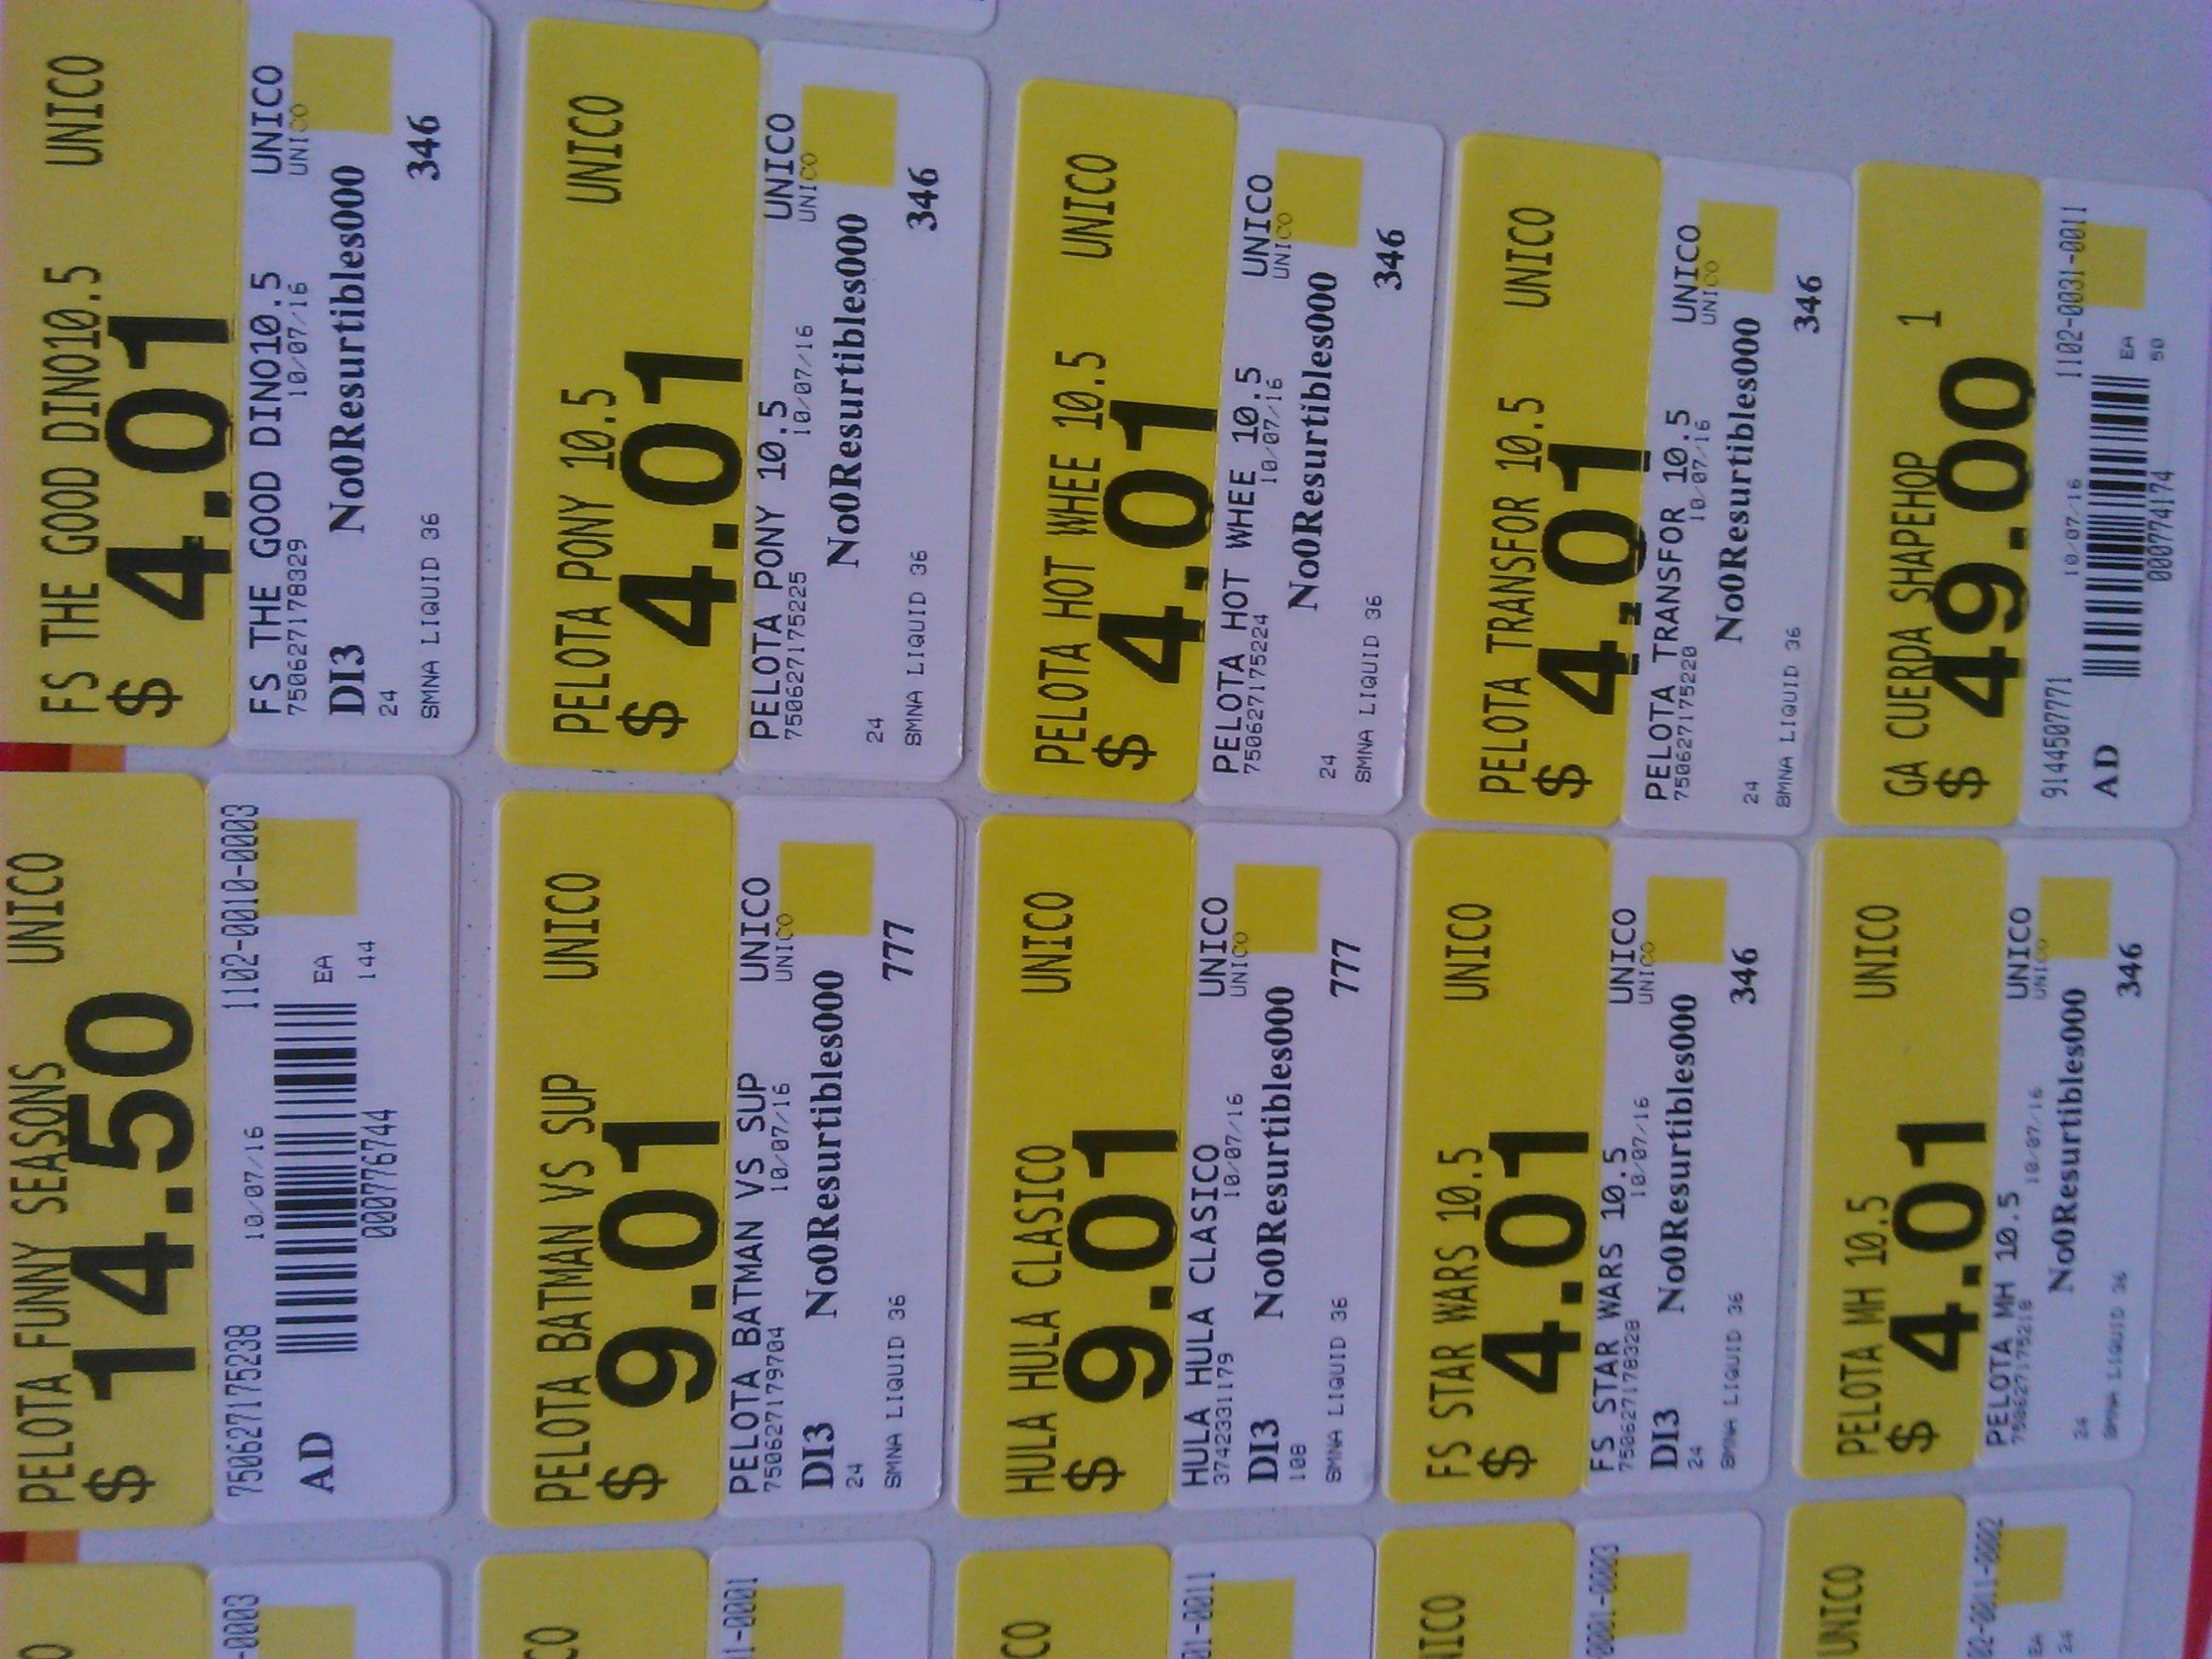 Walmart Miramontes: pelota mediana varios personajes a $4.01